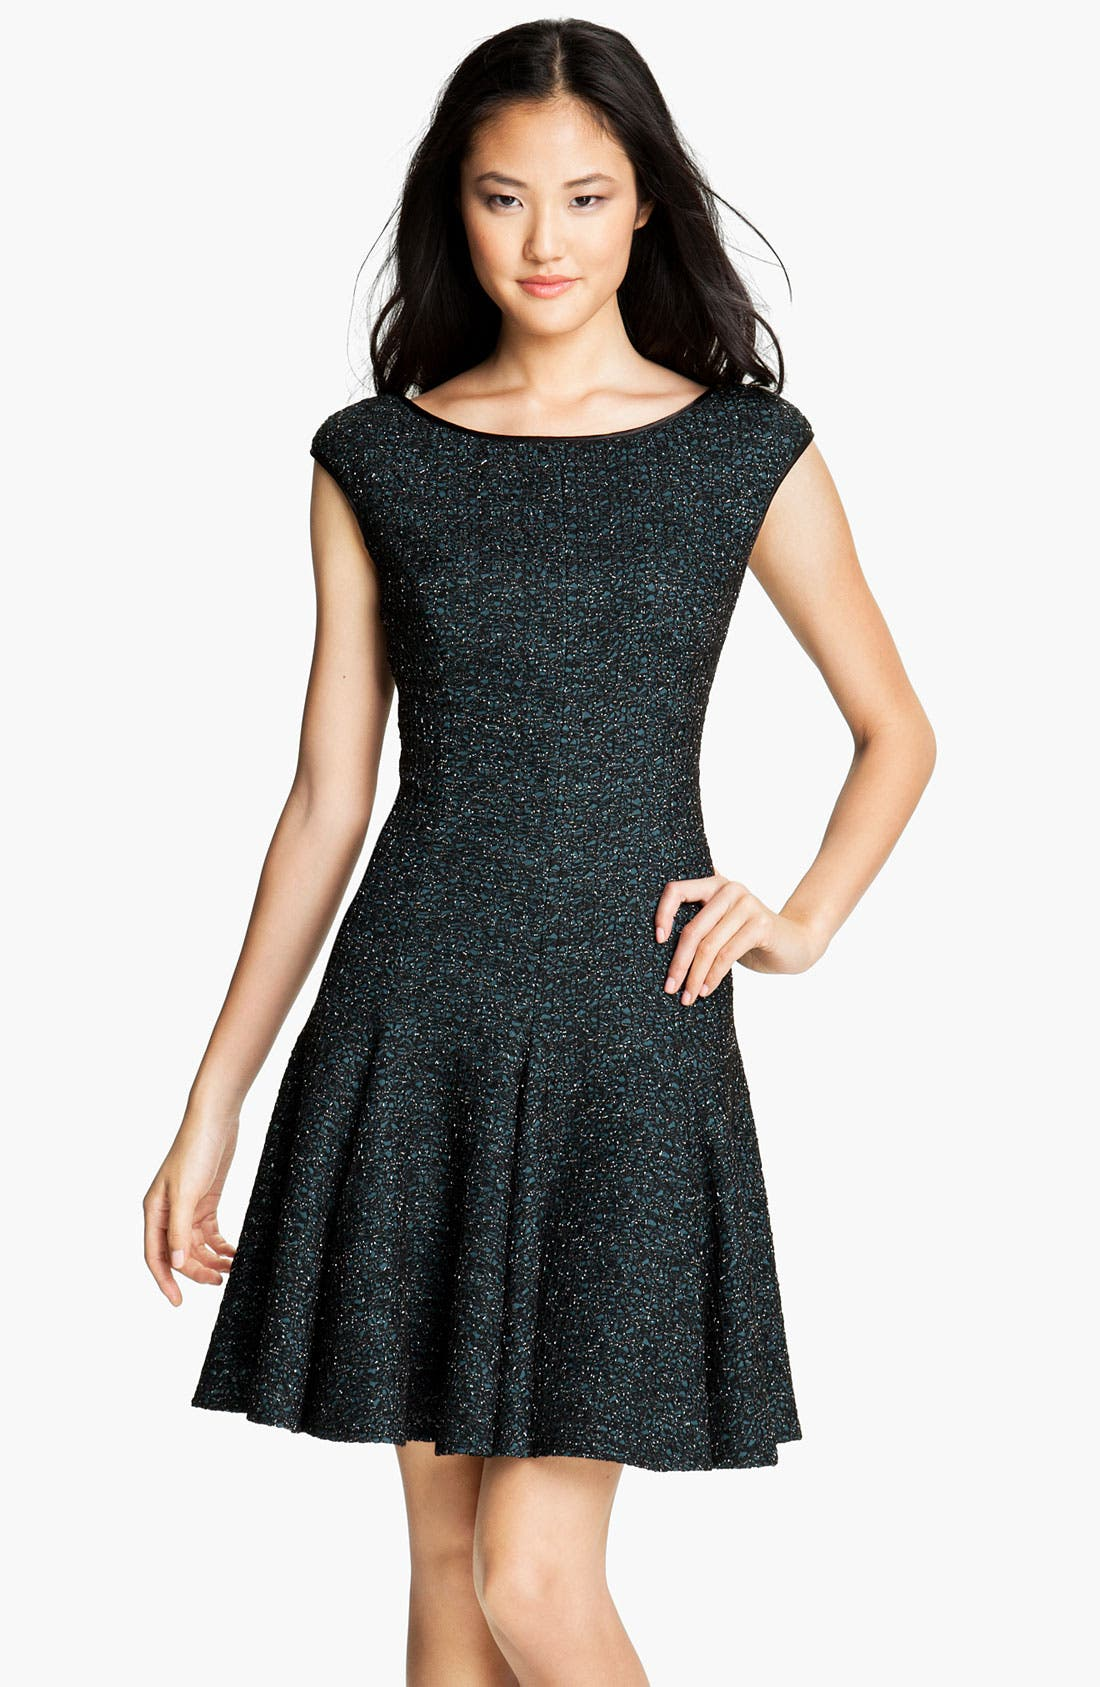 Alternate Image 1 Selected - Maggy London Scoop Back Metallic Fit & Flare Dress (Petite)